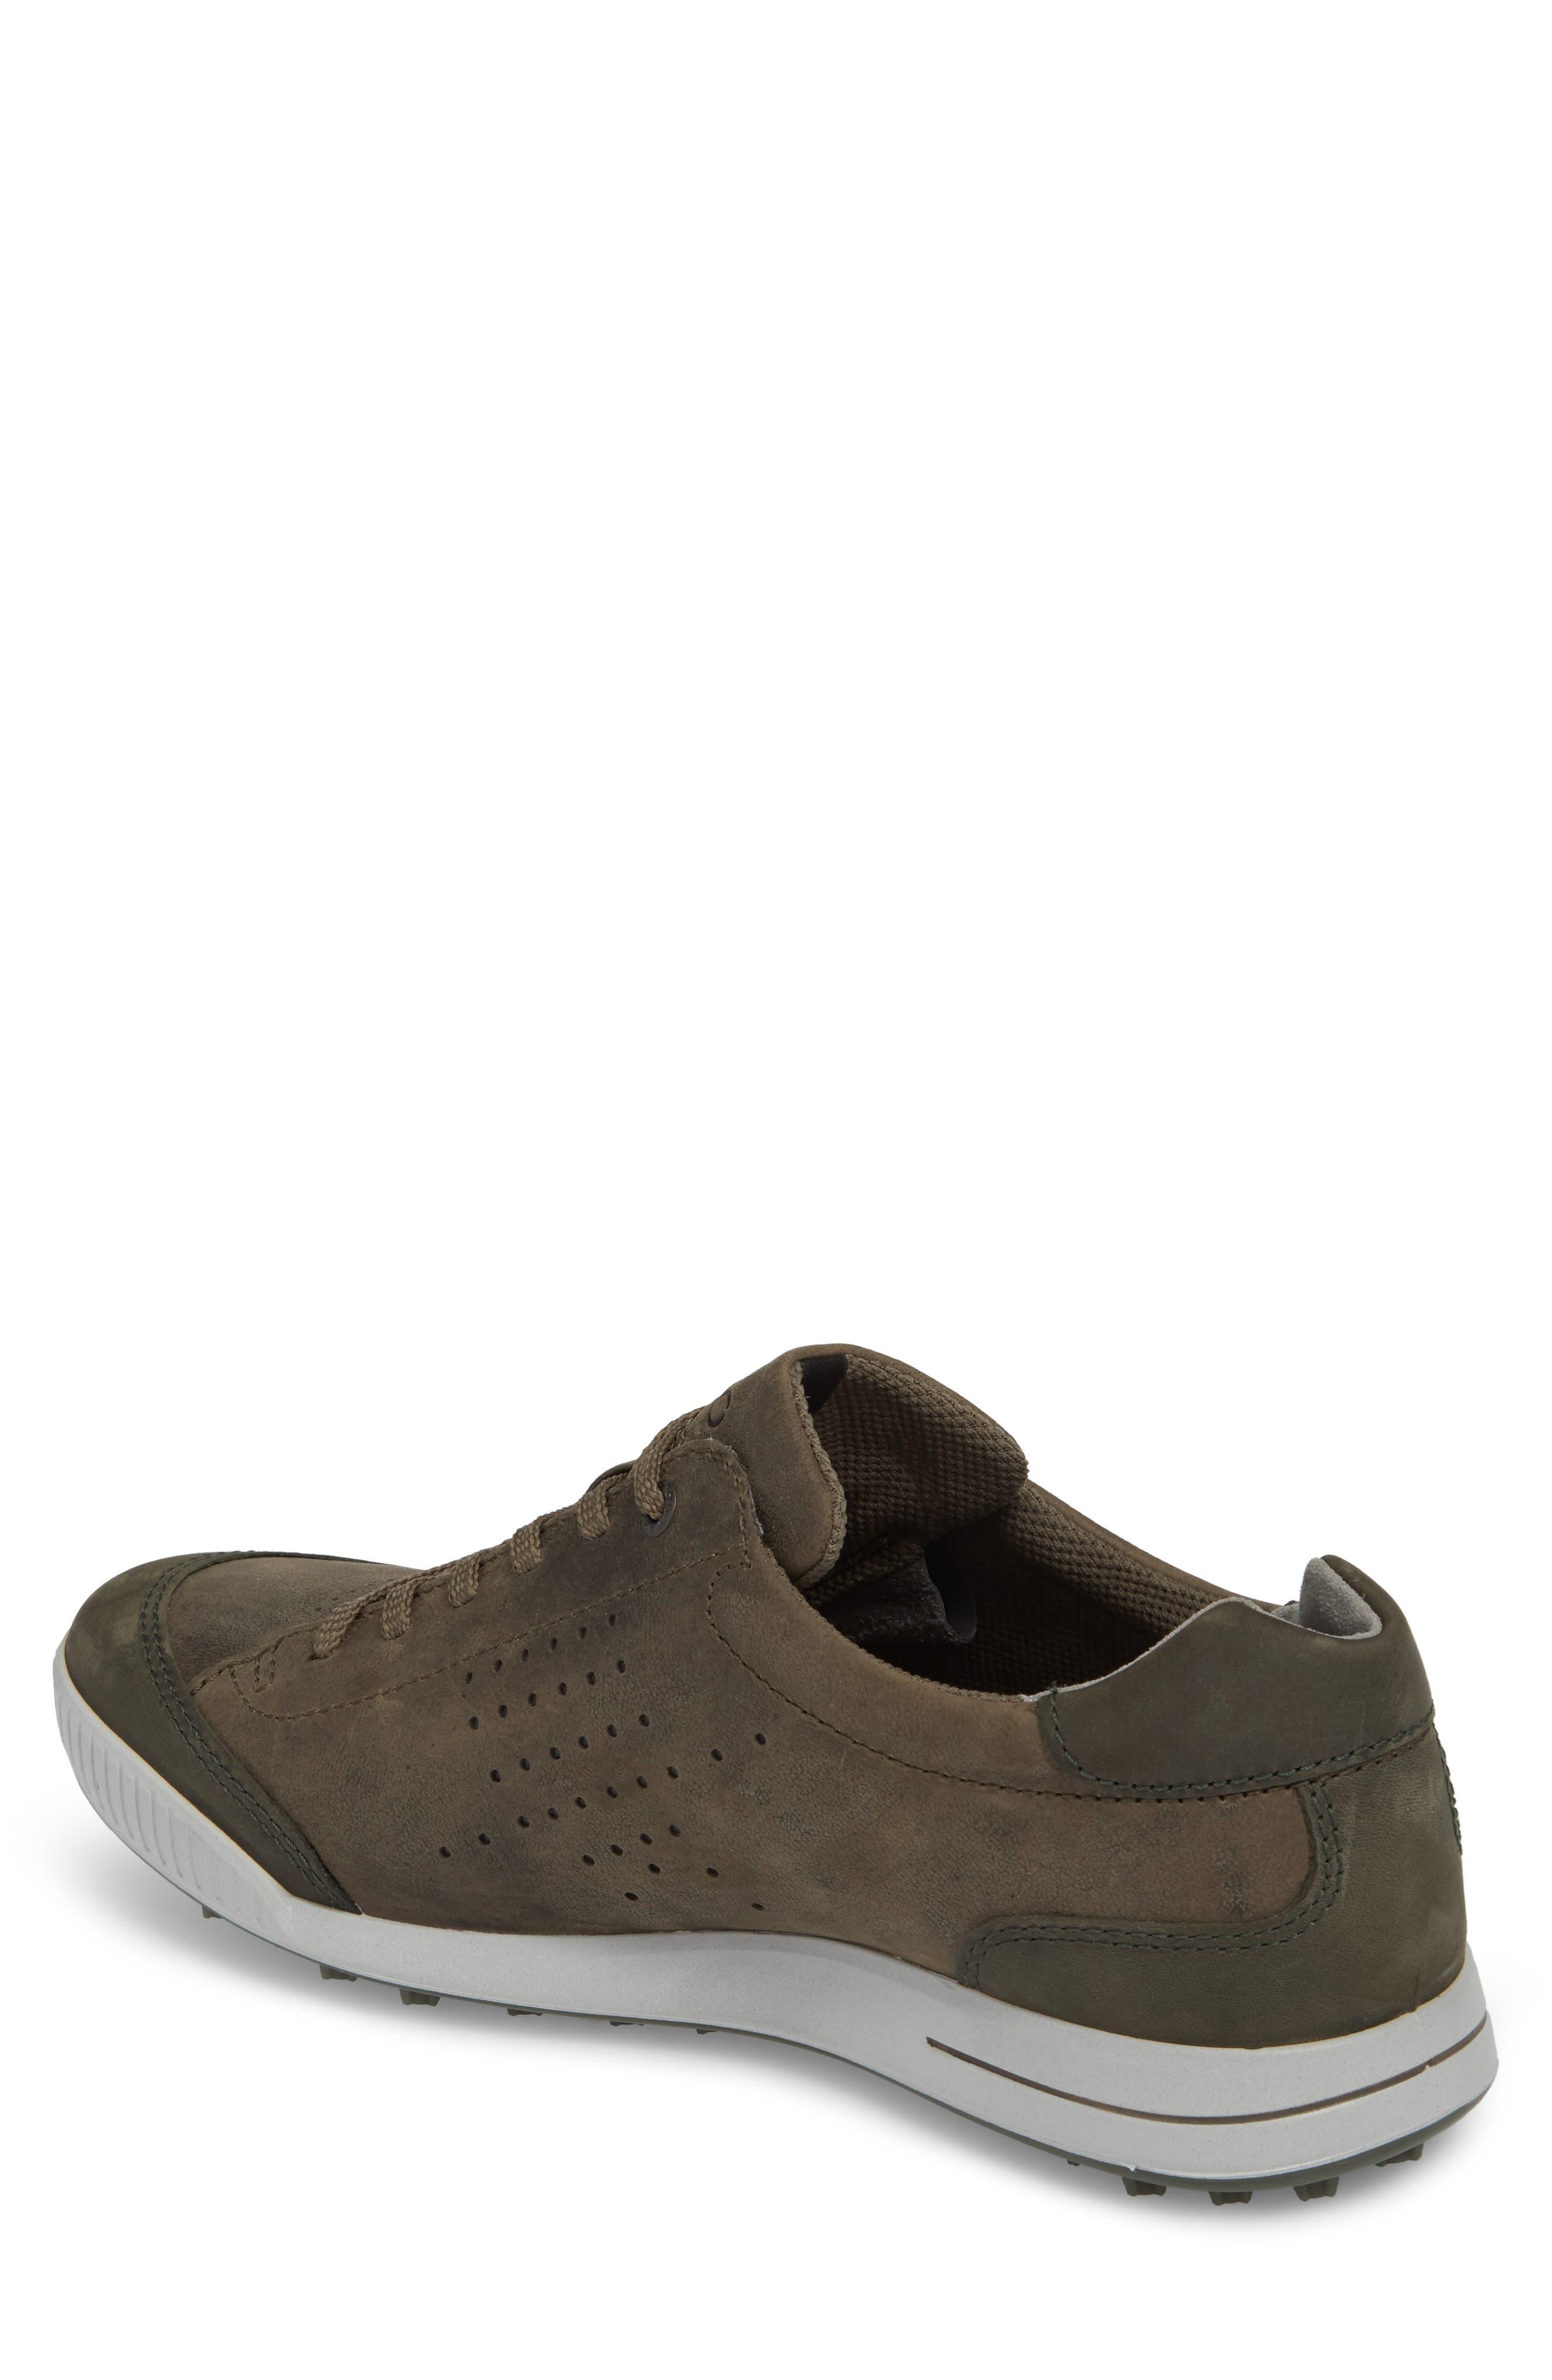 Alternate Image 2  - ECCO Street Retro HM Golf Shoe (Men)